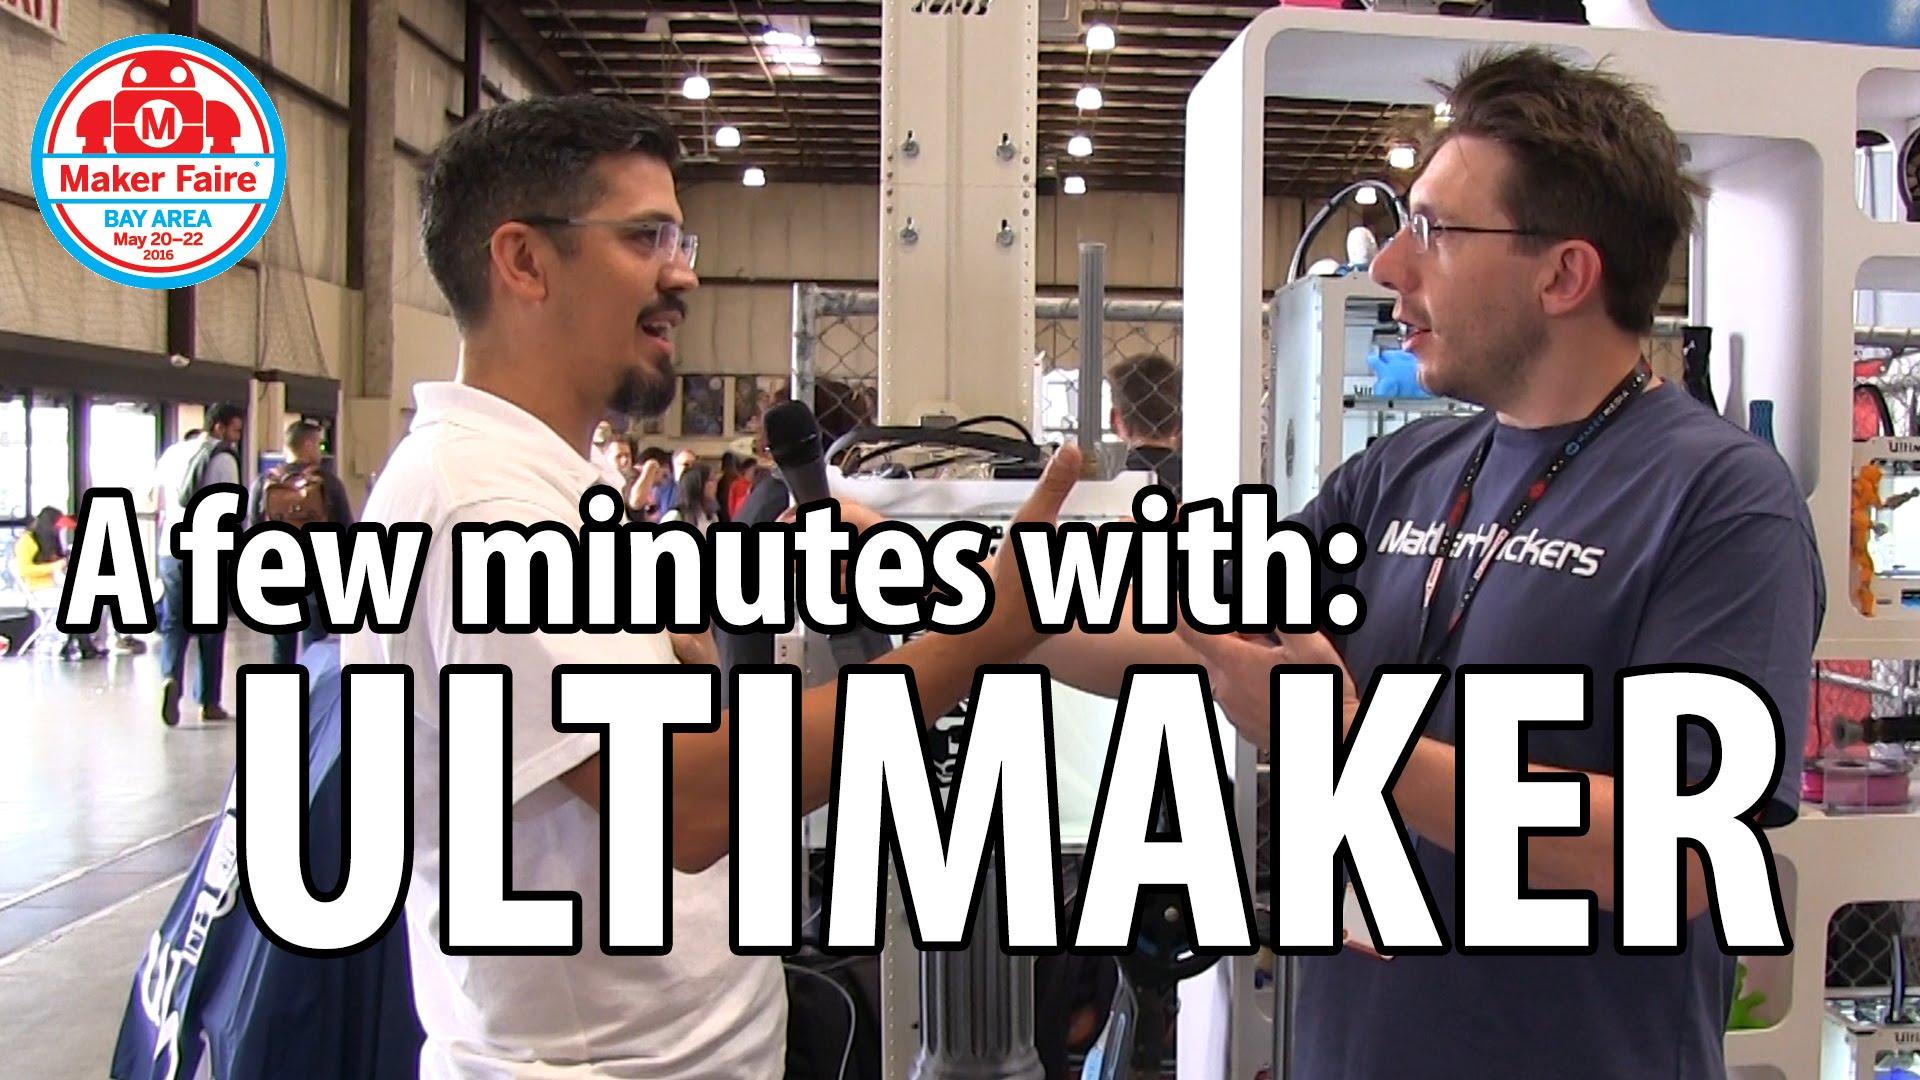 3D Printing: Ultimaker at Maker Faire 2016